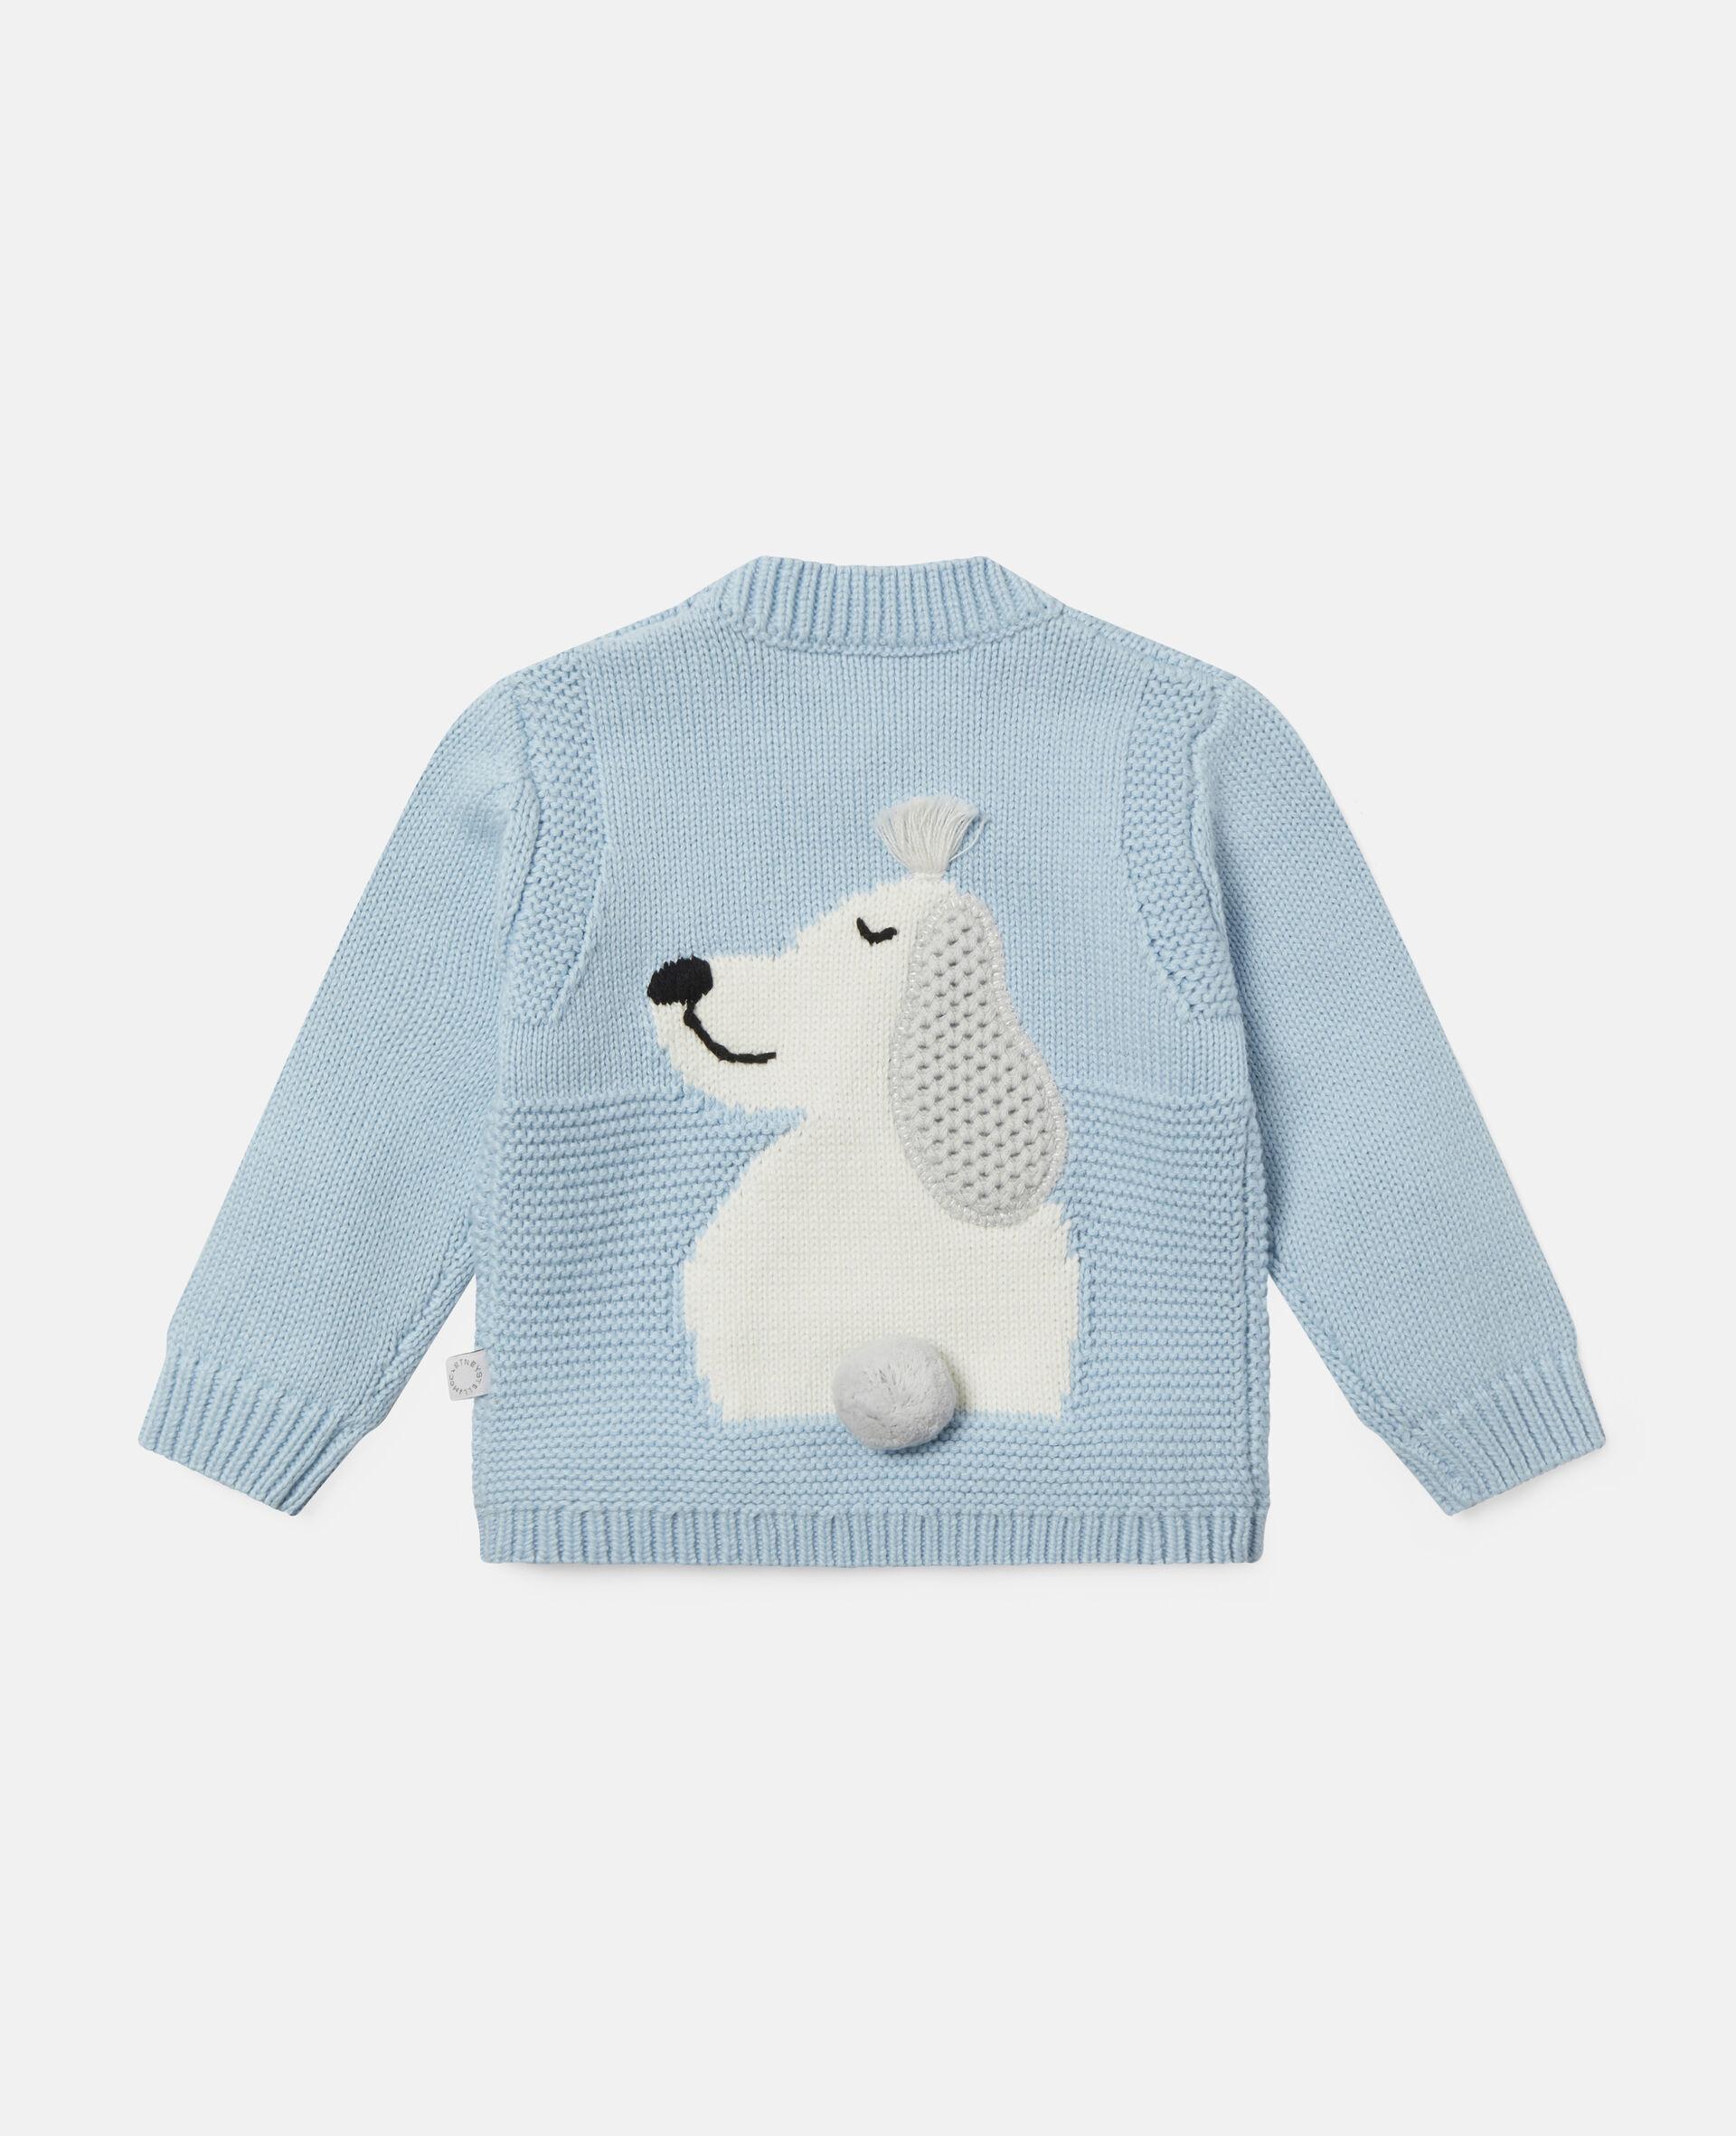 Happy Dog Knit Intarsia Sweater-Blue-large image number 3